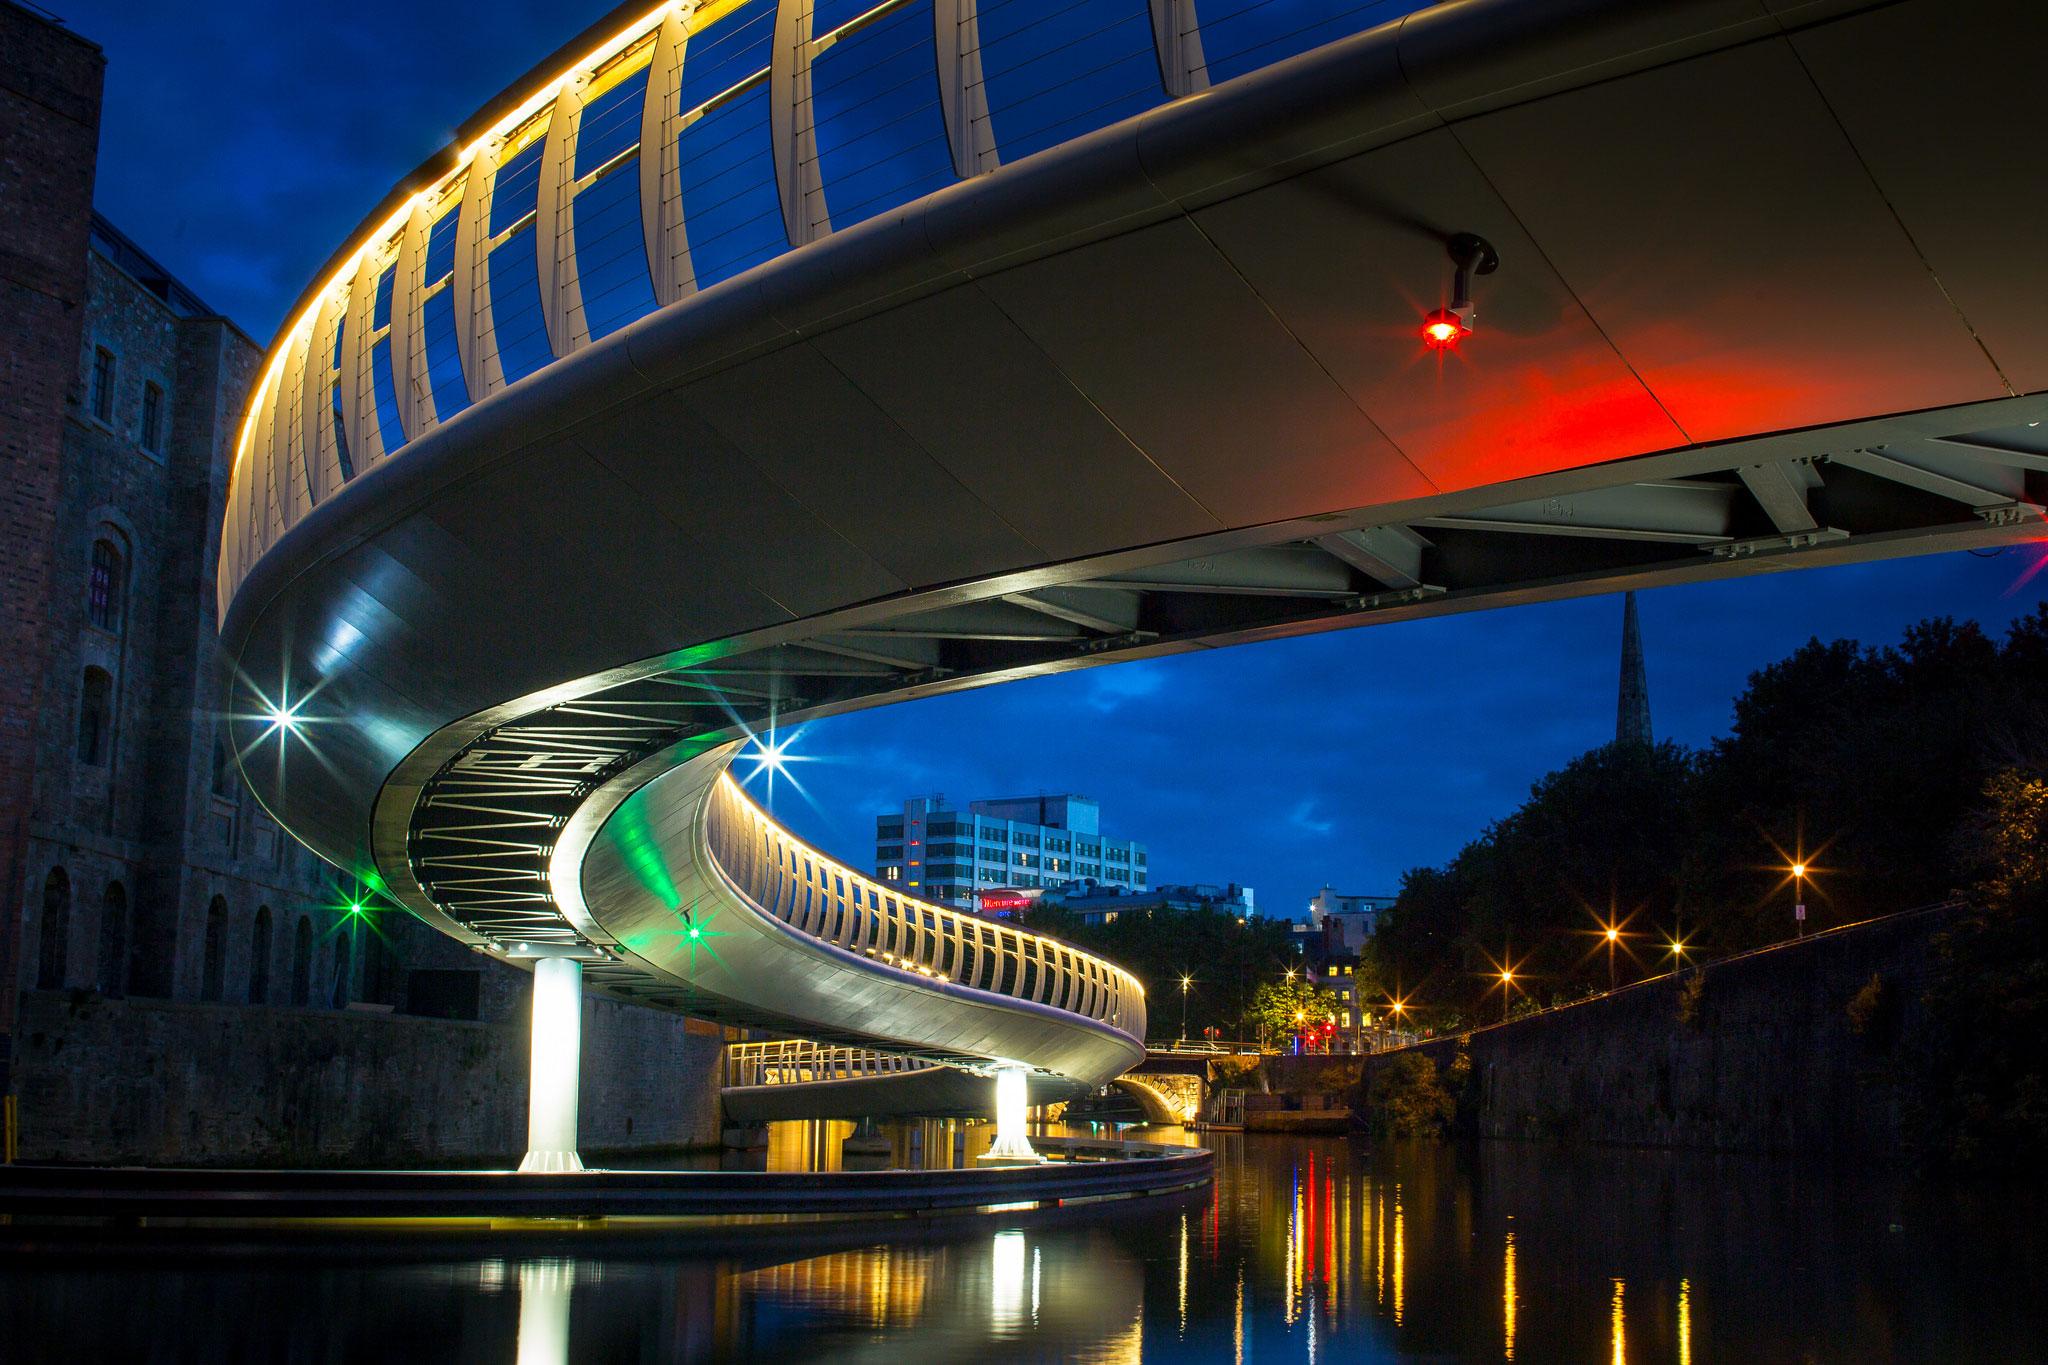 Castle Bridge, Finzels Reach, Bristol, UK, Photography Finzels Reach Bridge